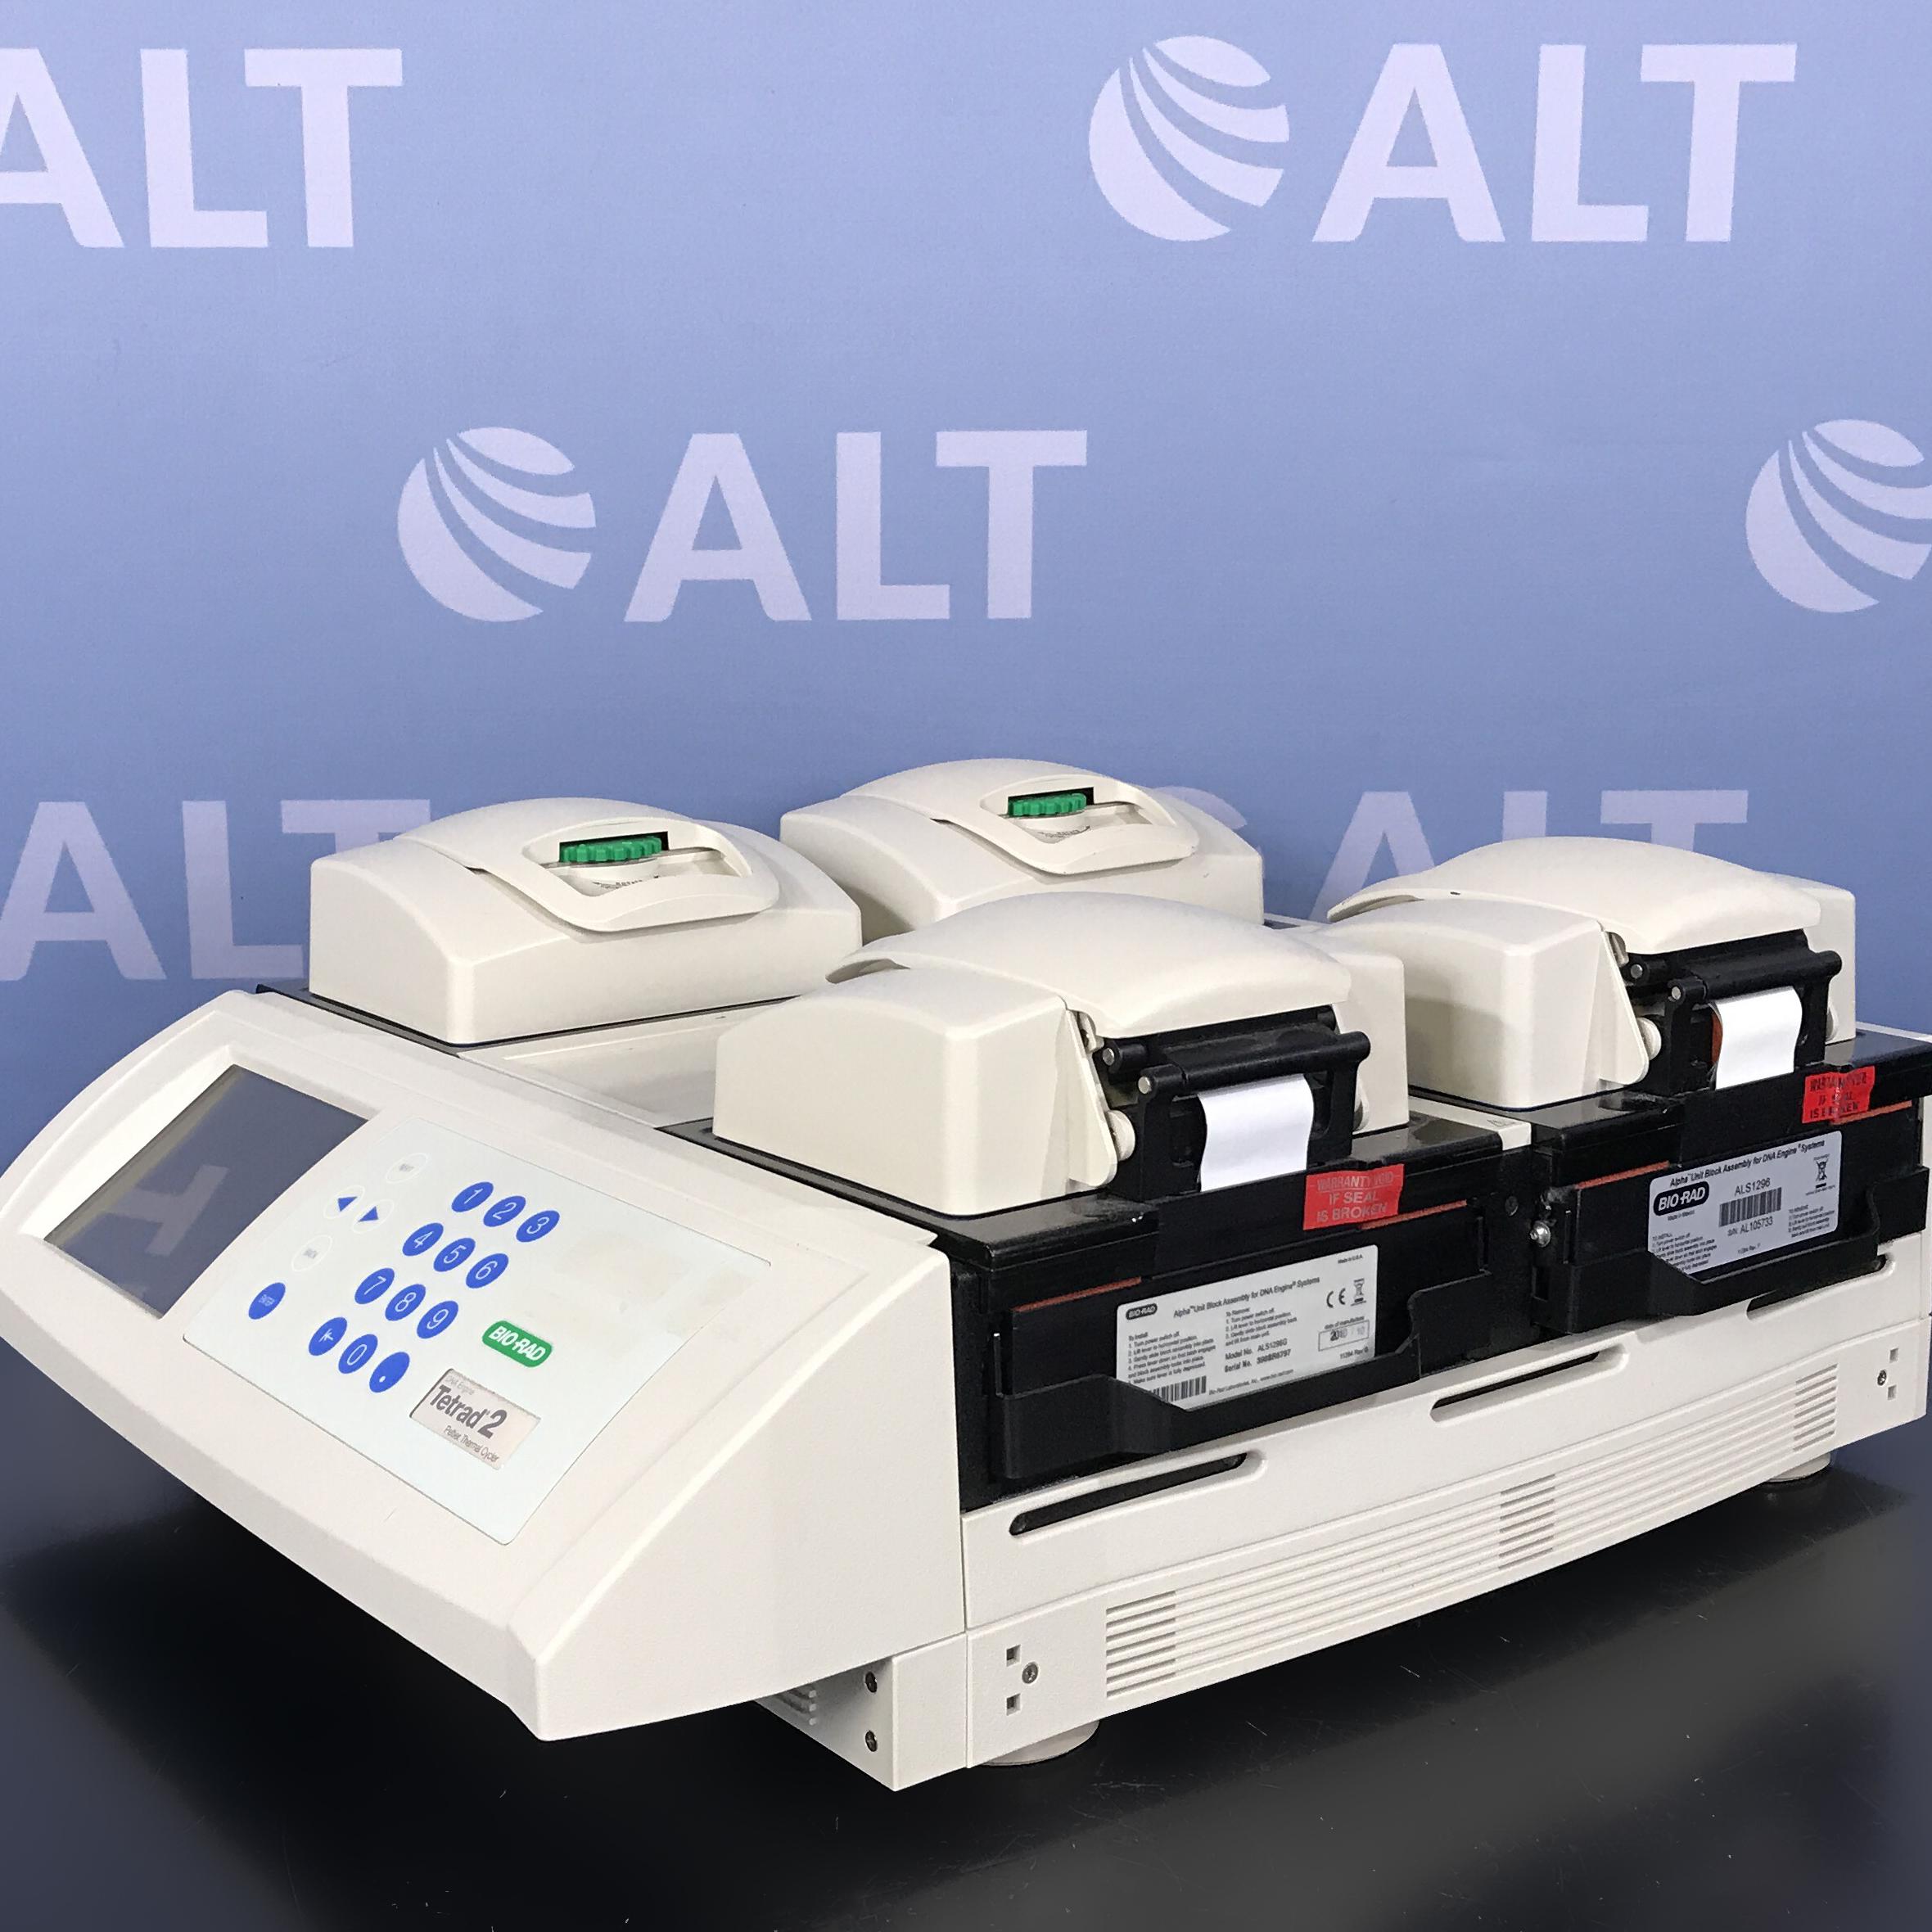 Bio-Rad DNA Engine Tetrad 2 Peltier Thermal Cycler Model PTC-0240 Image